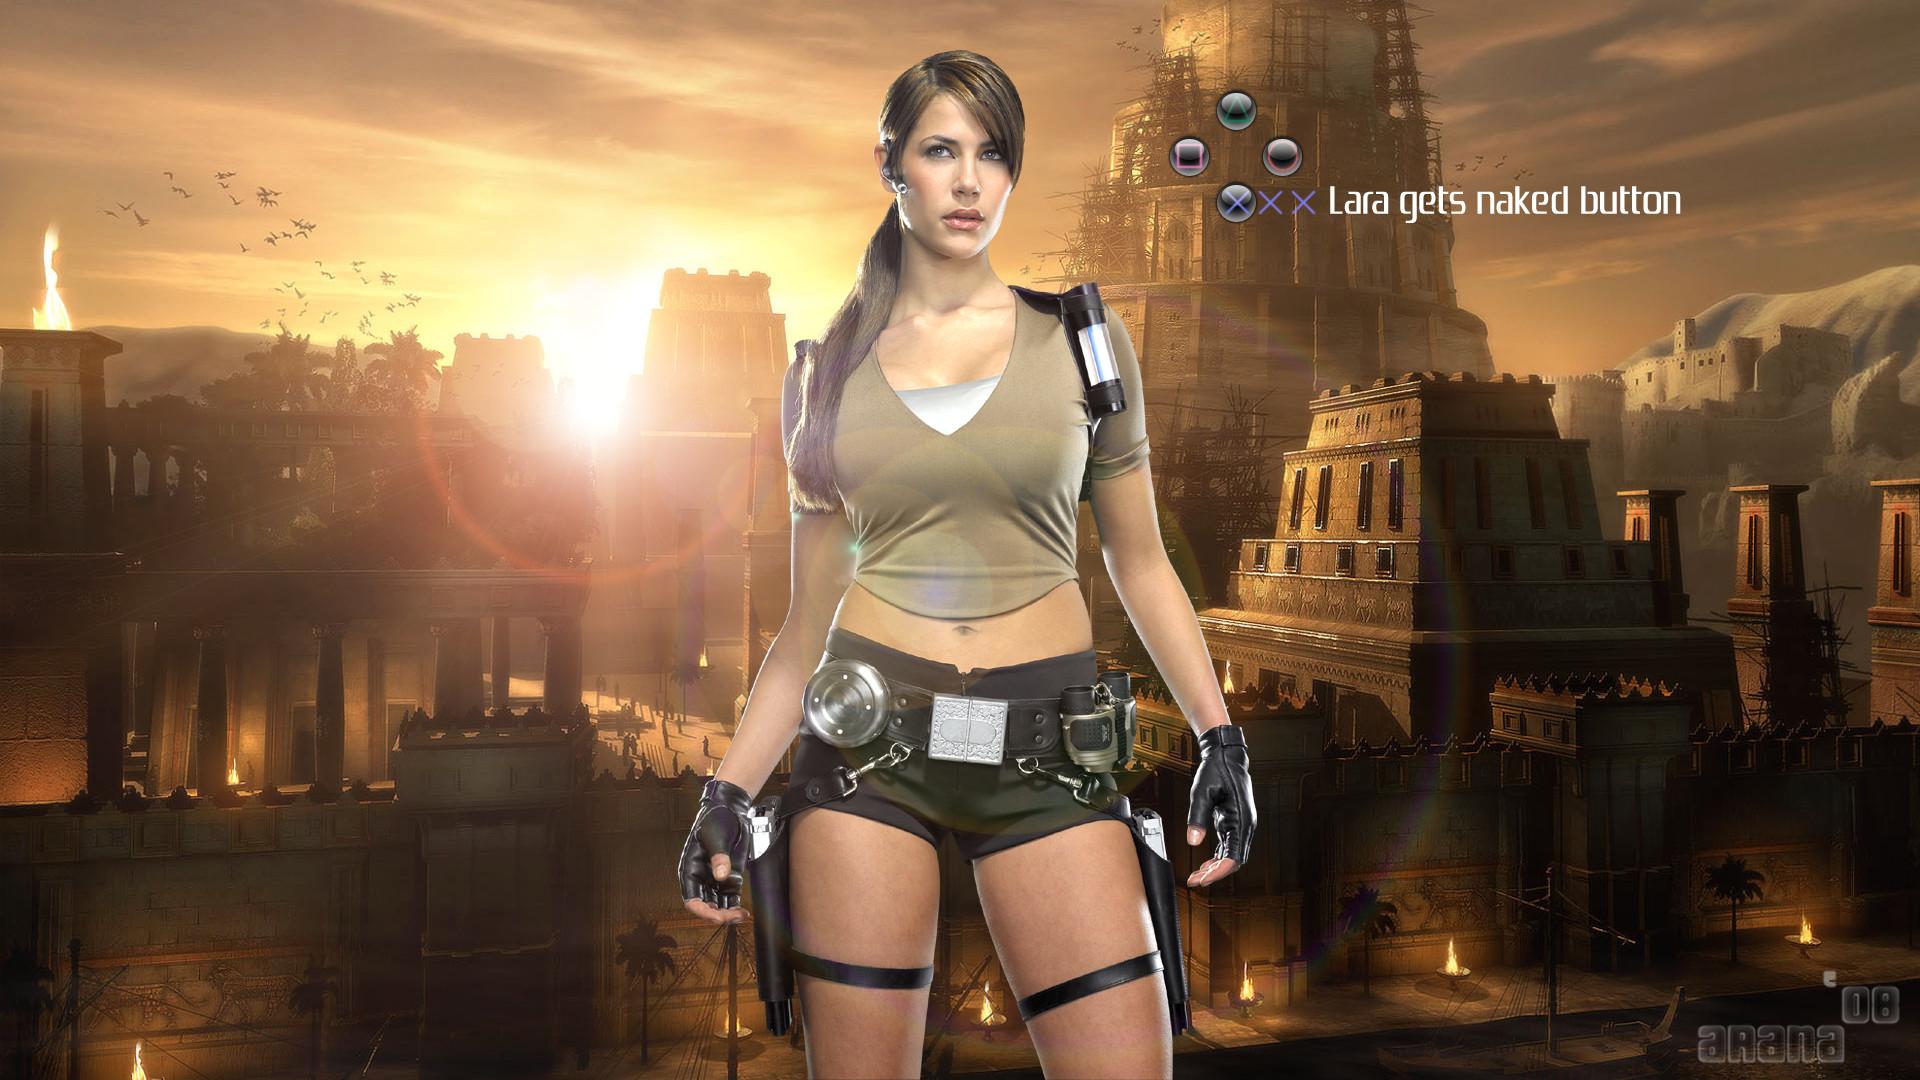 HD Wallpapers Lara Croft HDTV 1080p